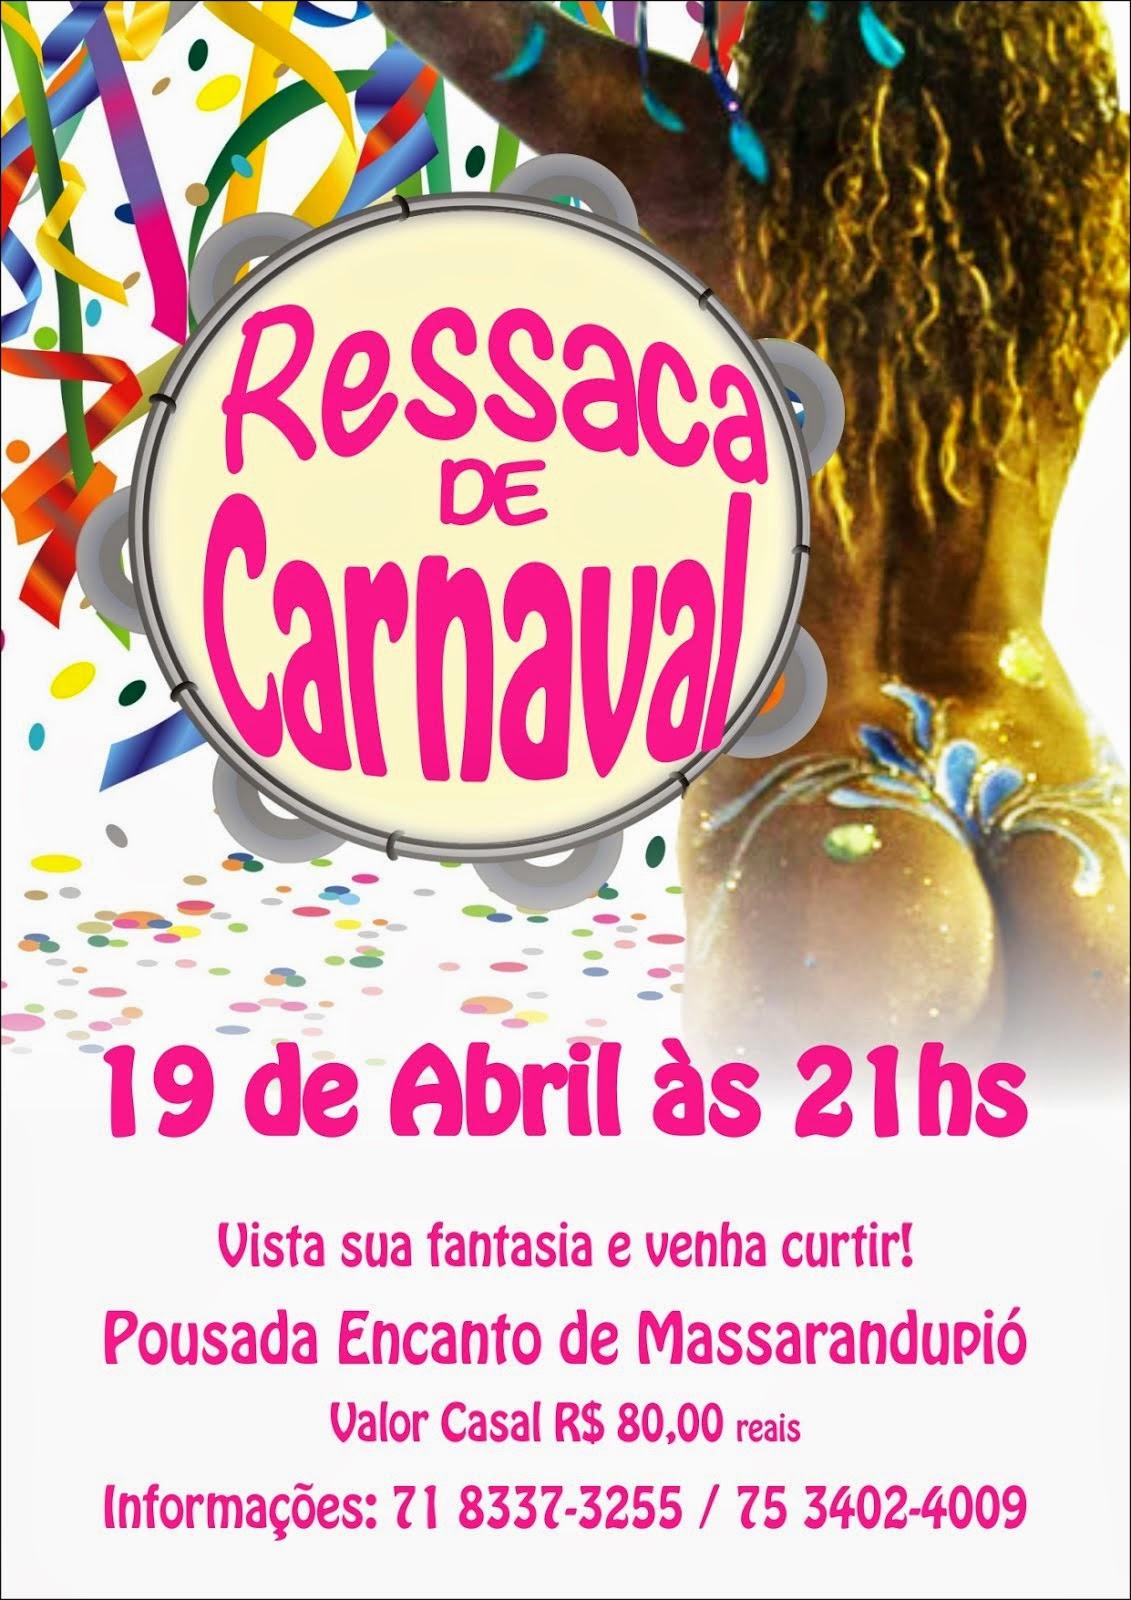 FESTA RESSACA DE CARNAVAL 2014